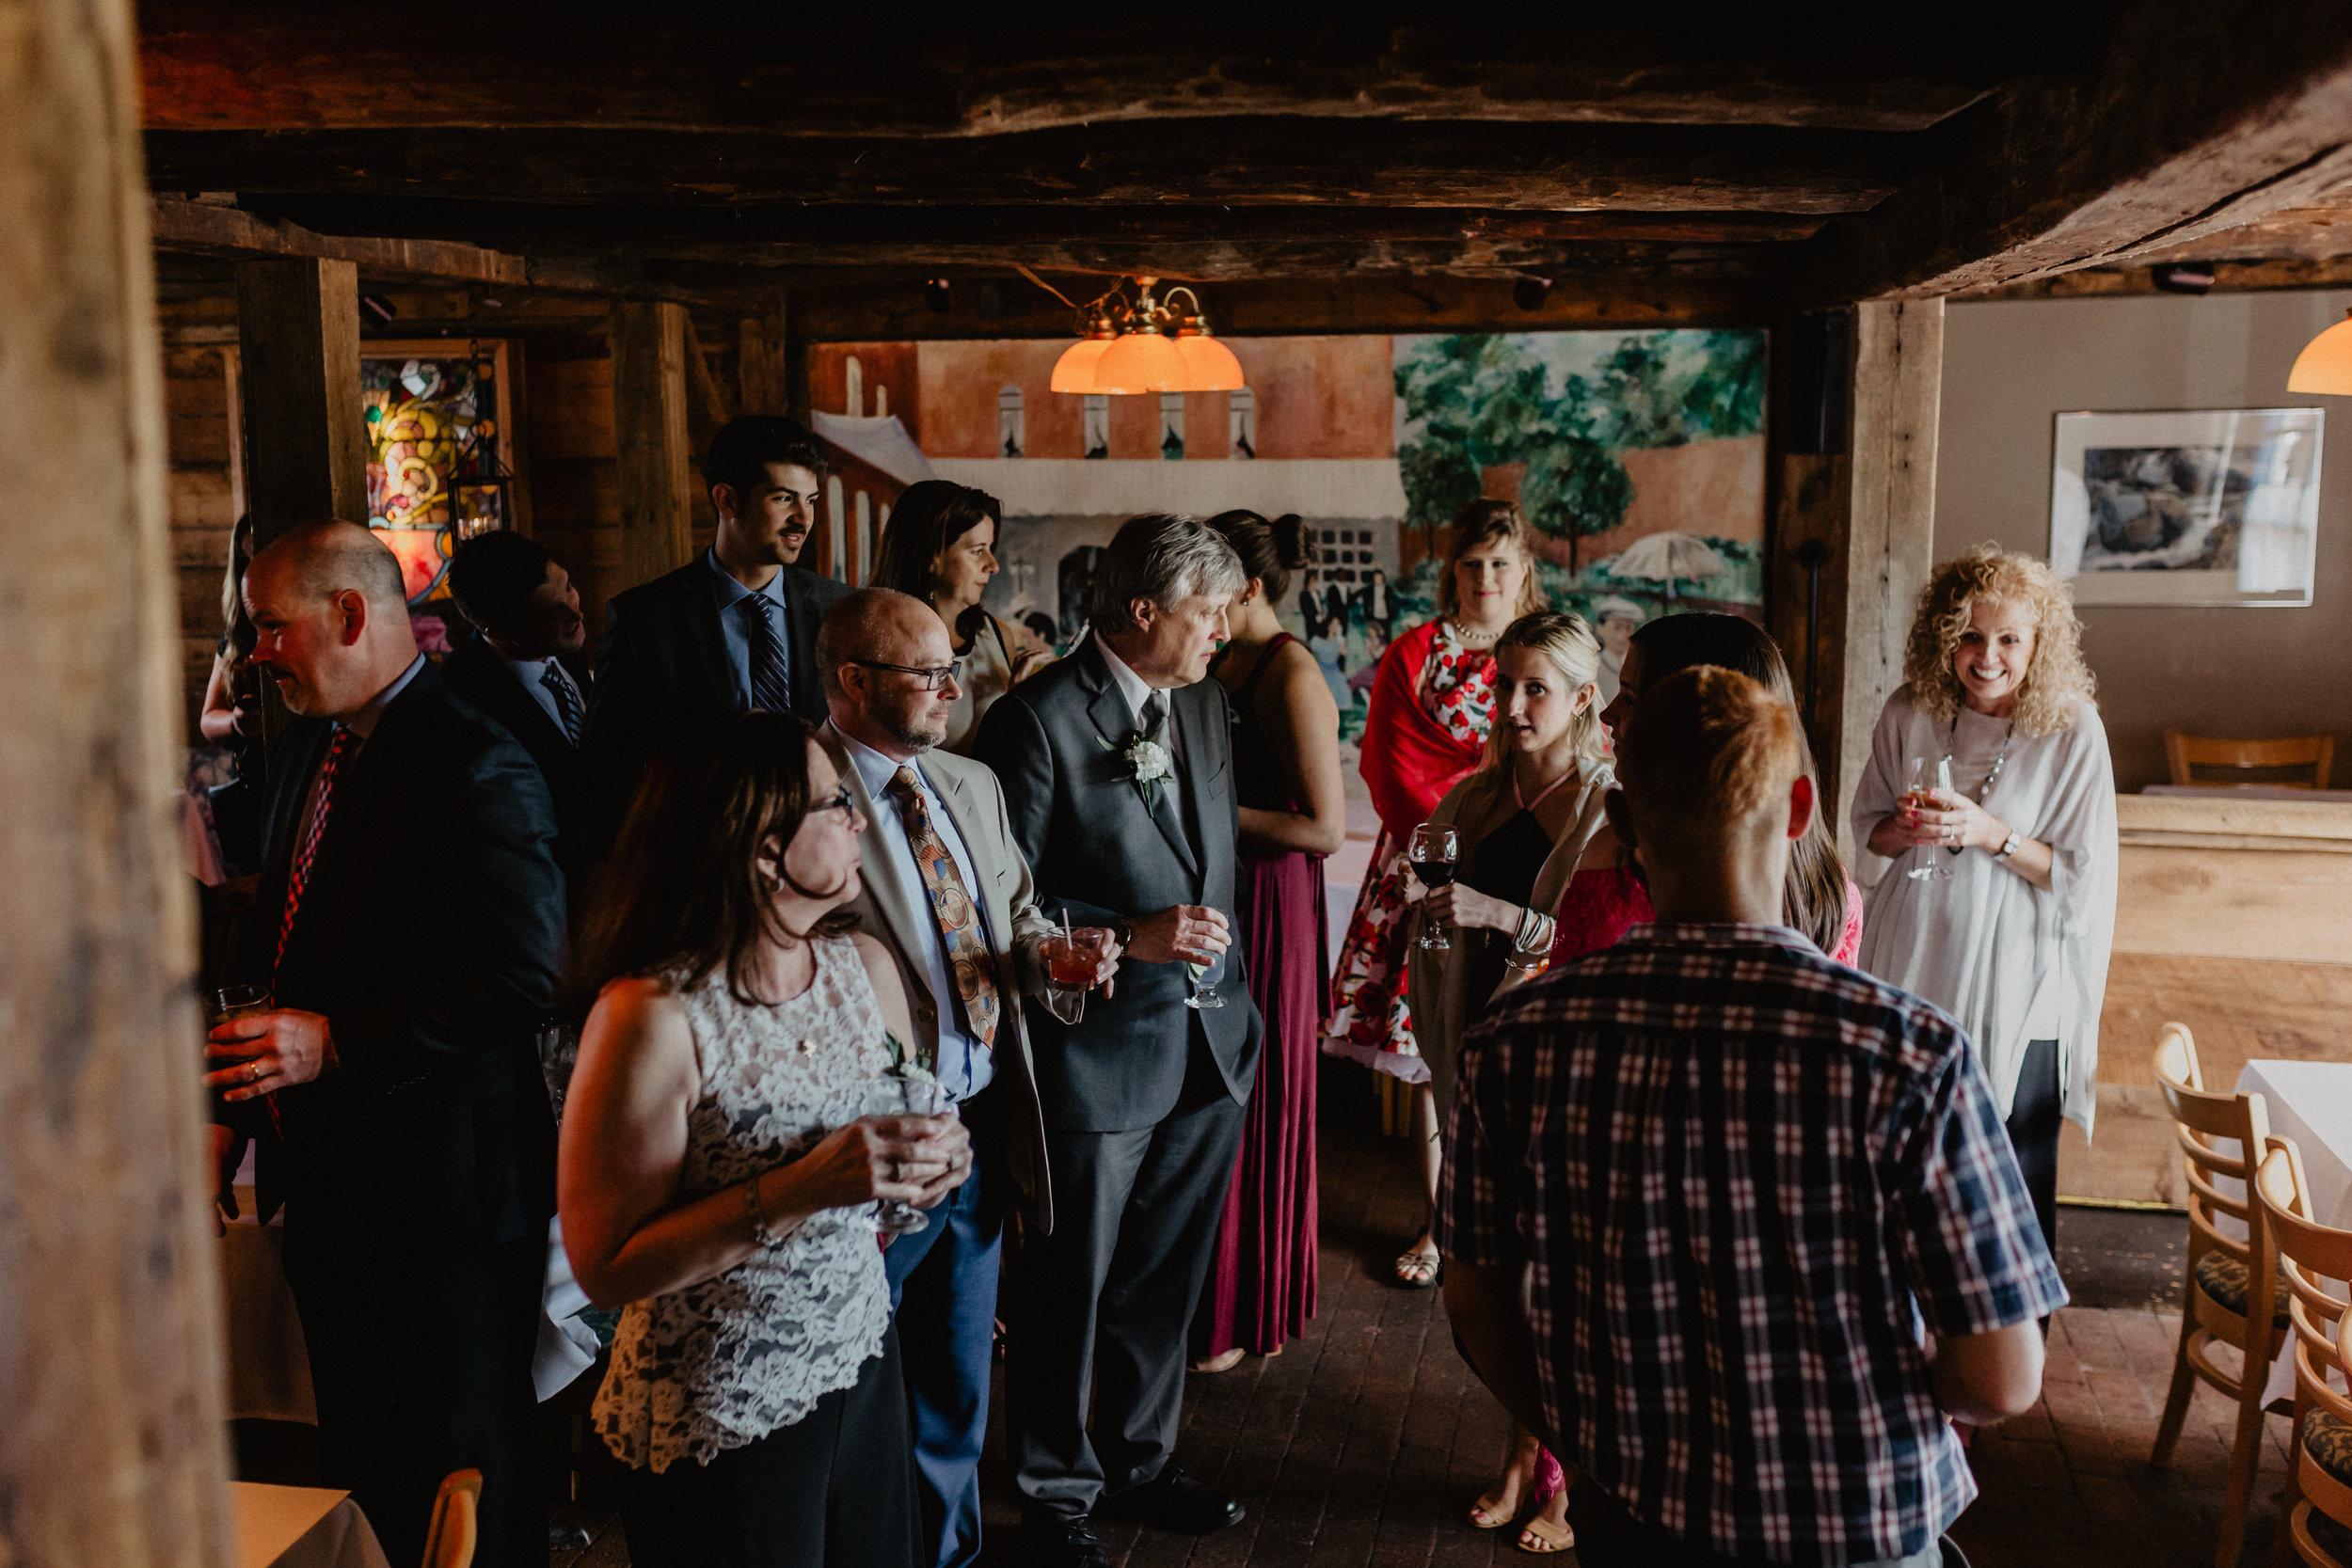 upstate_ny_wedding-41.jpg